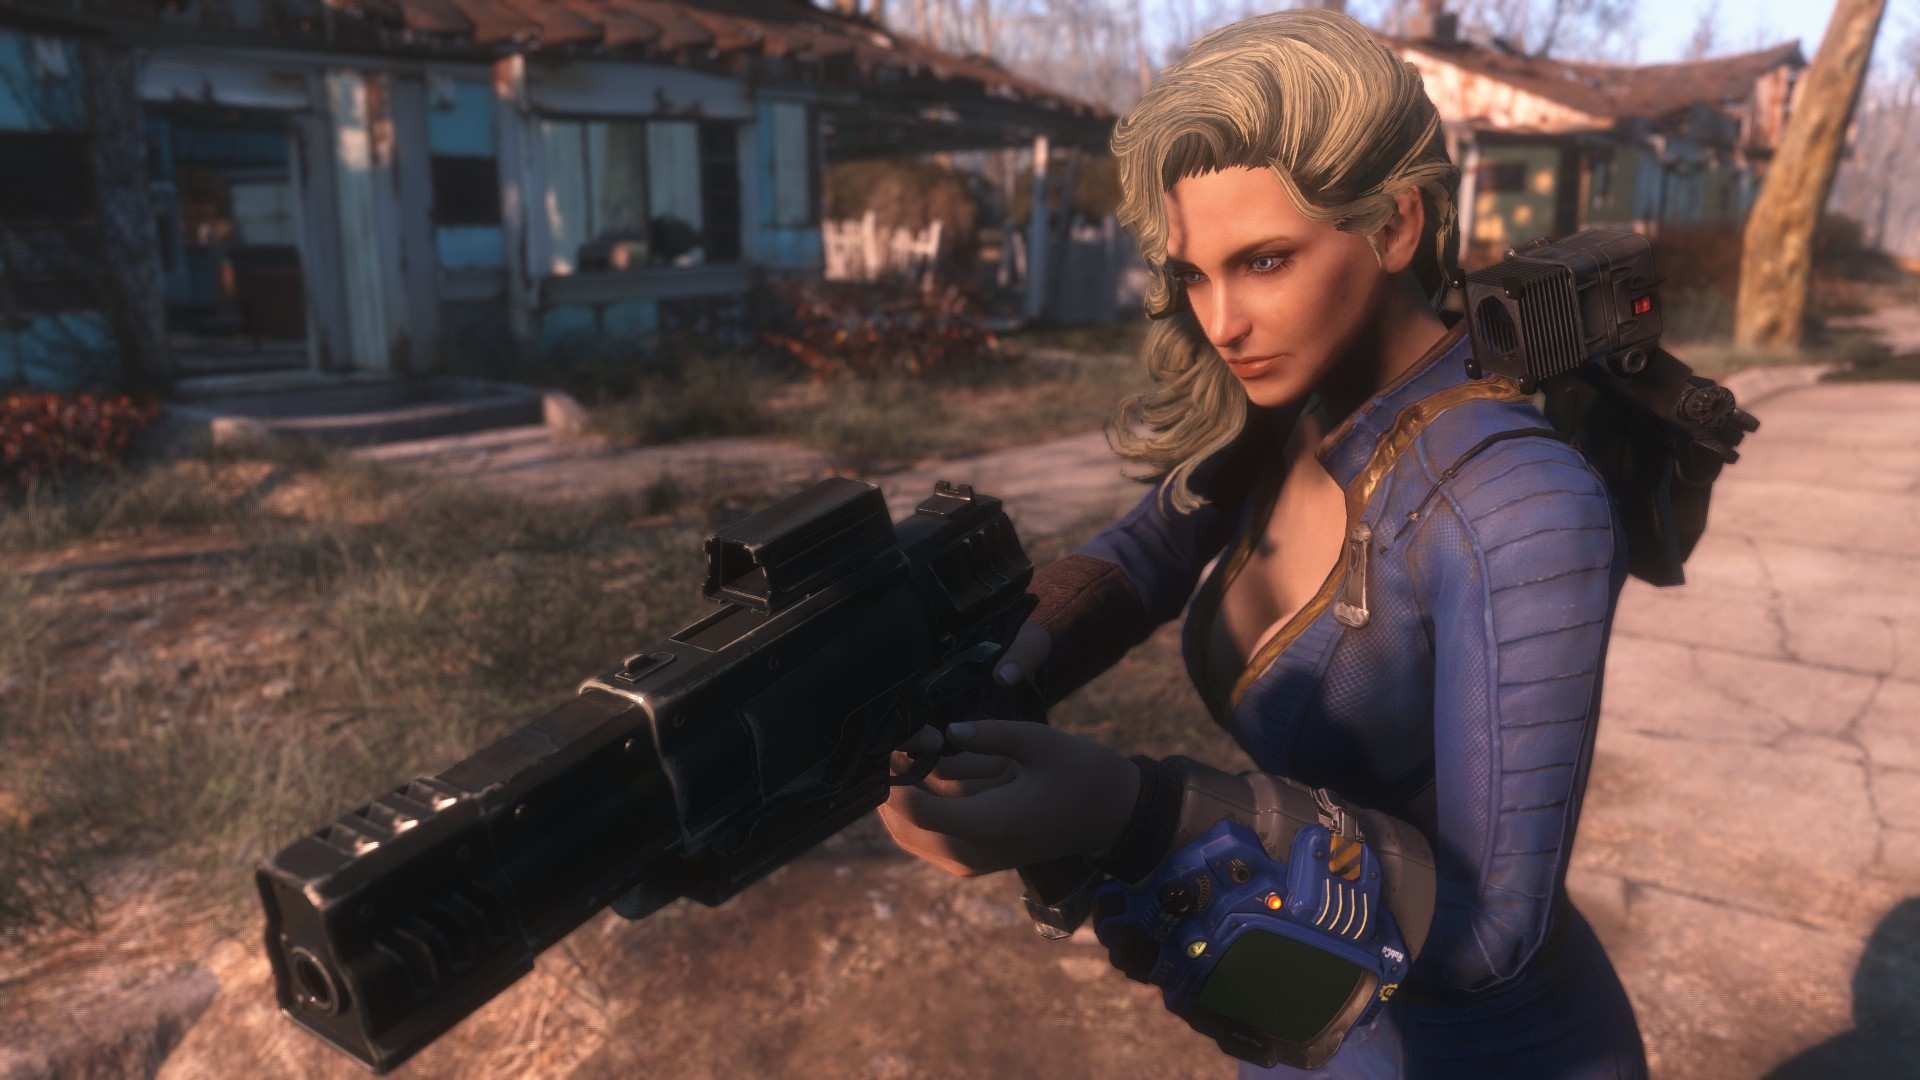 TNR Shoulder Lamp 日本語化対応 バックパック - Fallout4 Mod ...